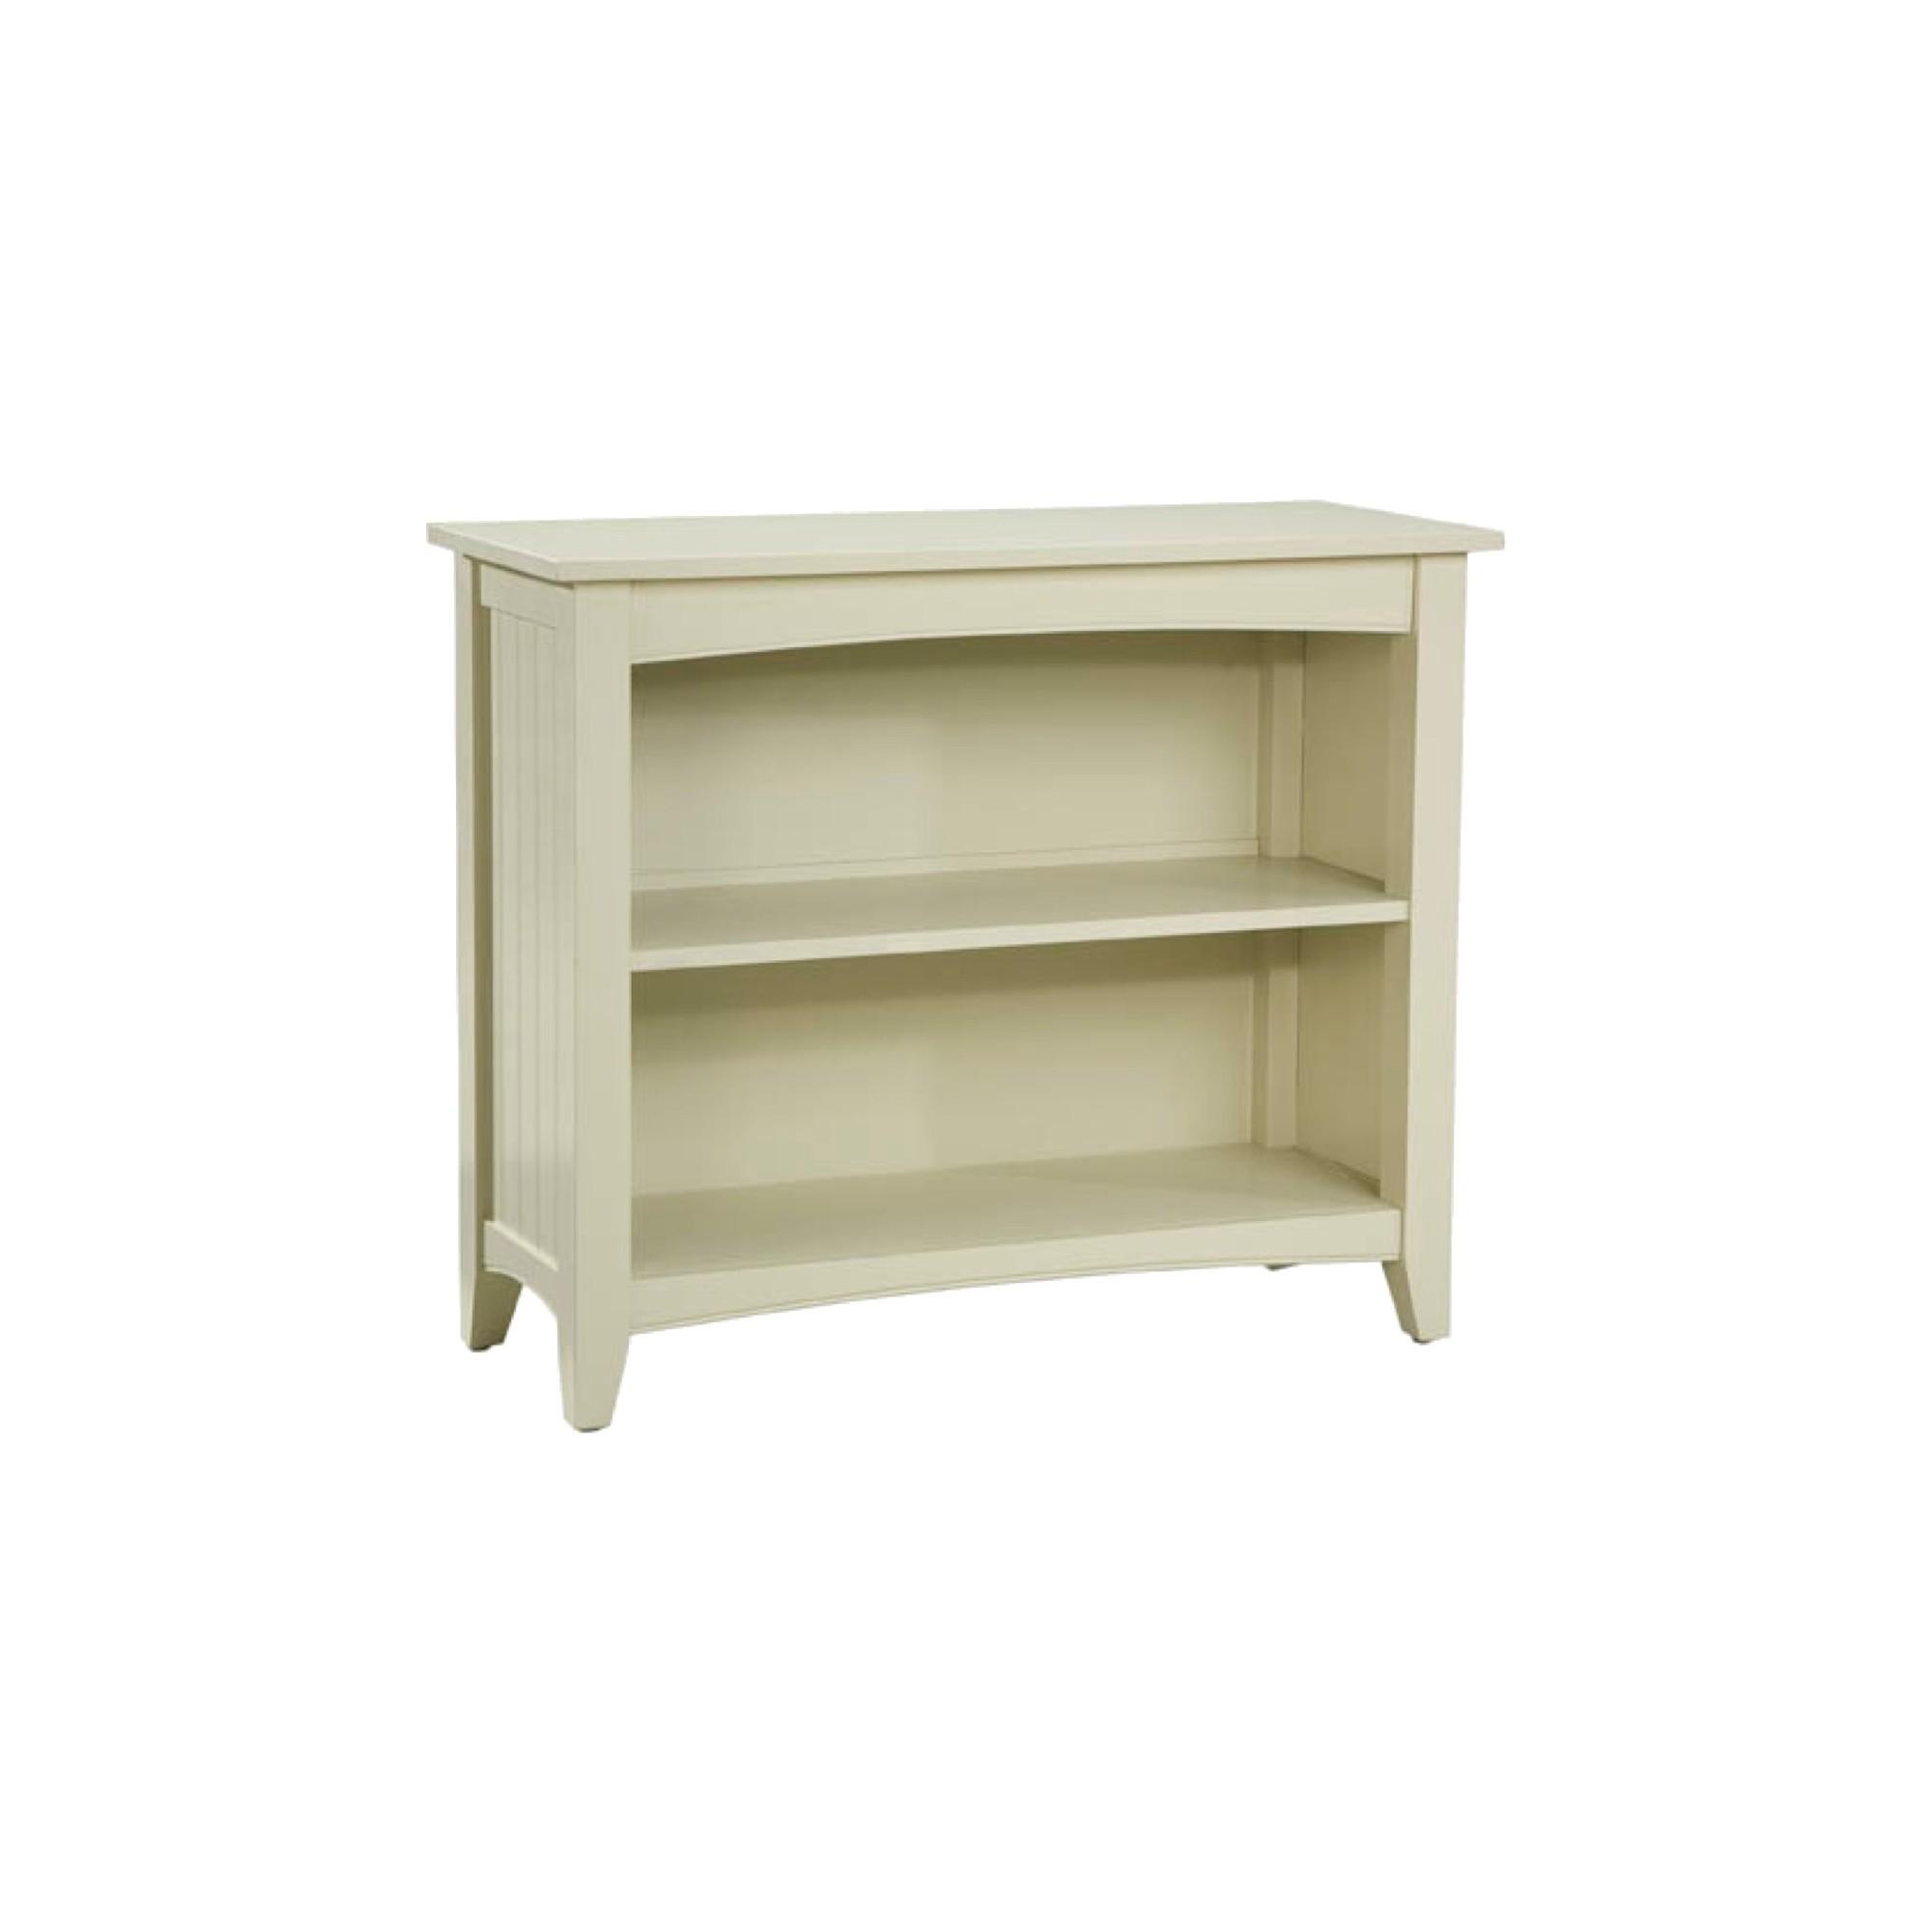 30 2-shelf Bookcase Hardwood Sand (Brown) - Alaterre Furniture